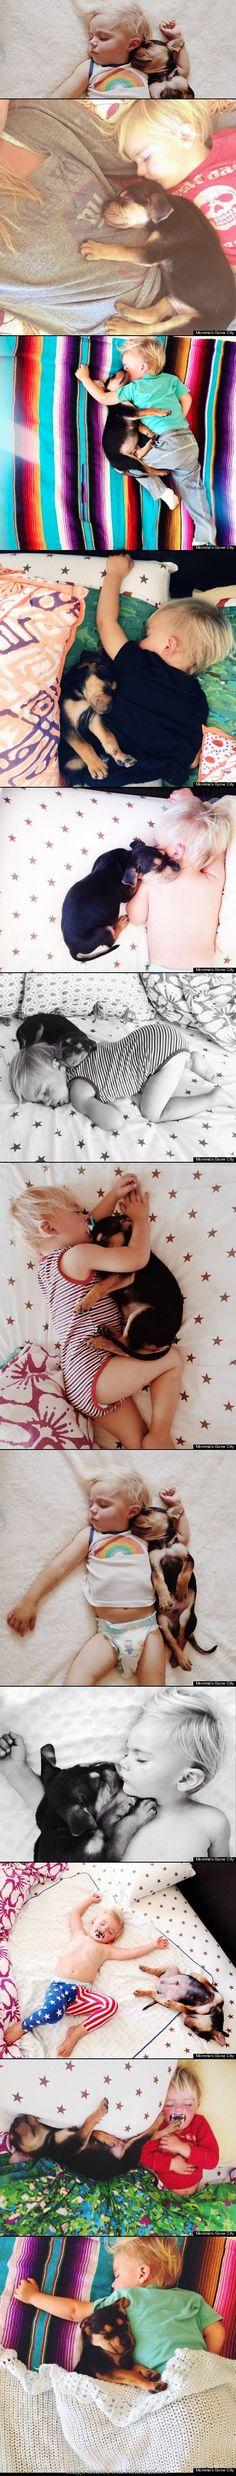 Theo & Beau take naps. #love #kids #puppies